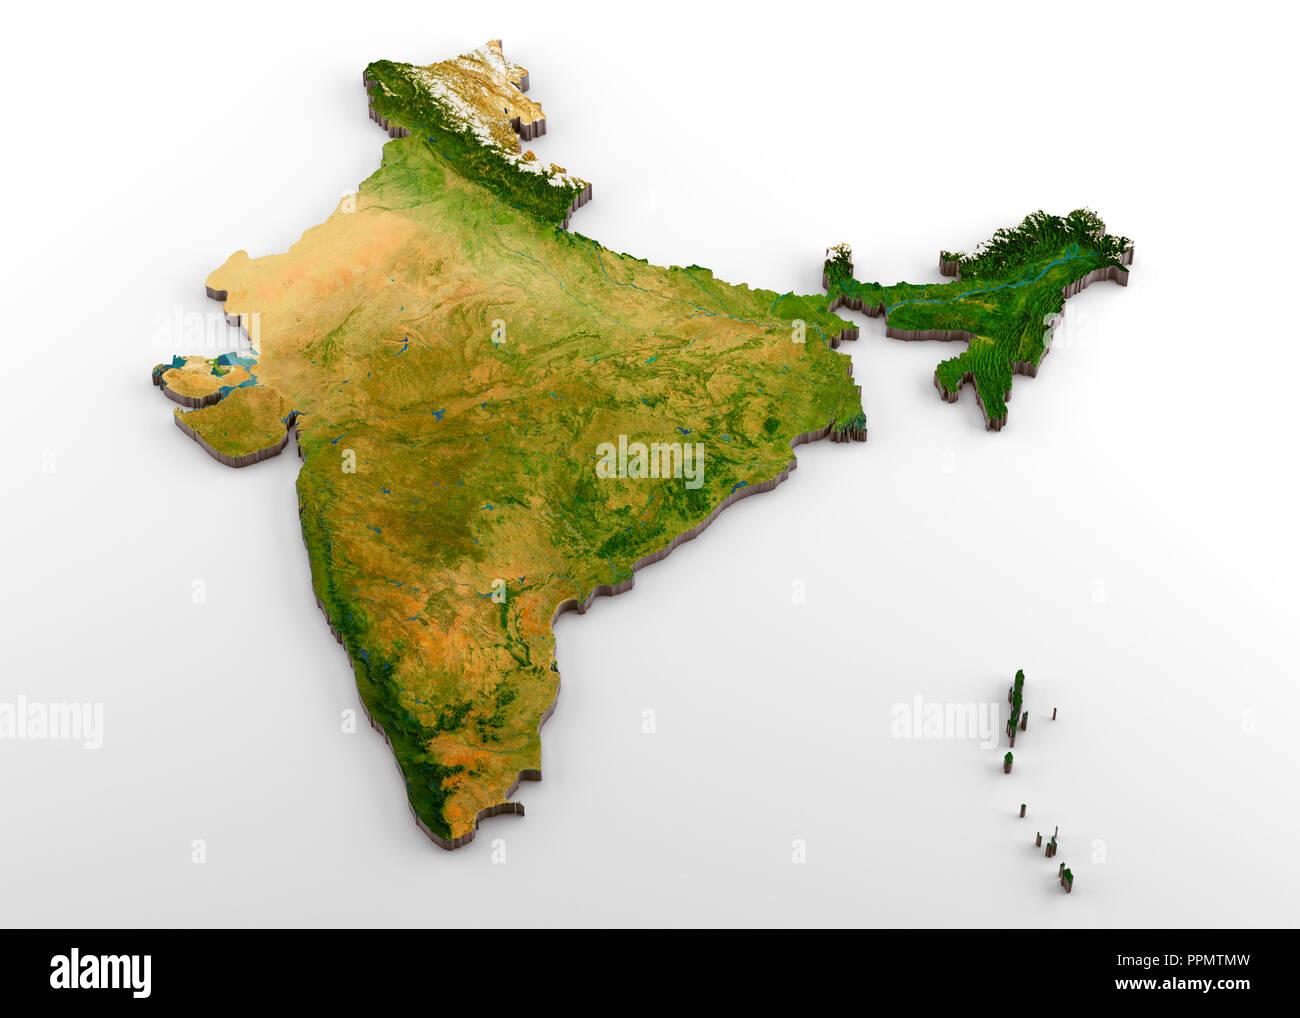 India Map 3d Stock Photos & India Map 3d Stock Images - Alamy on